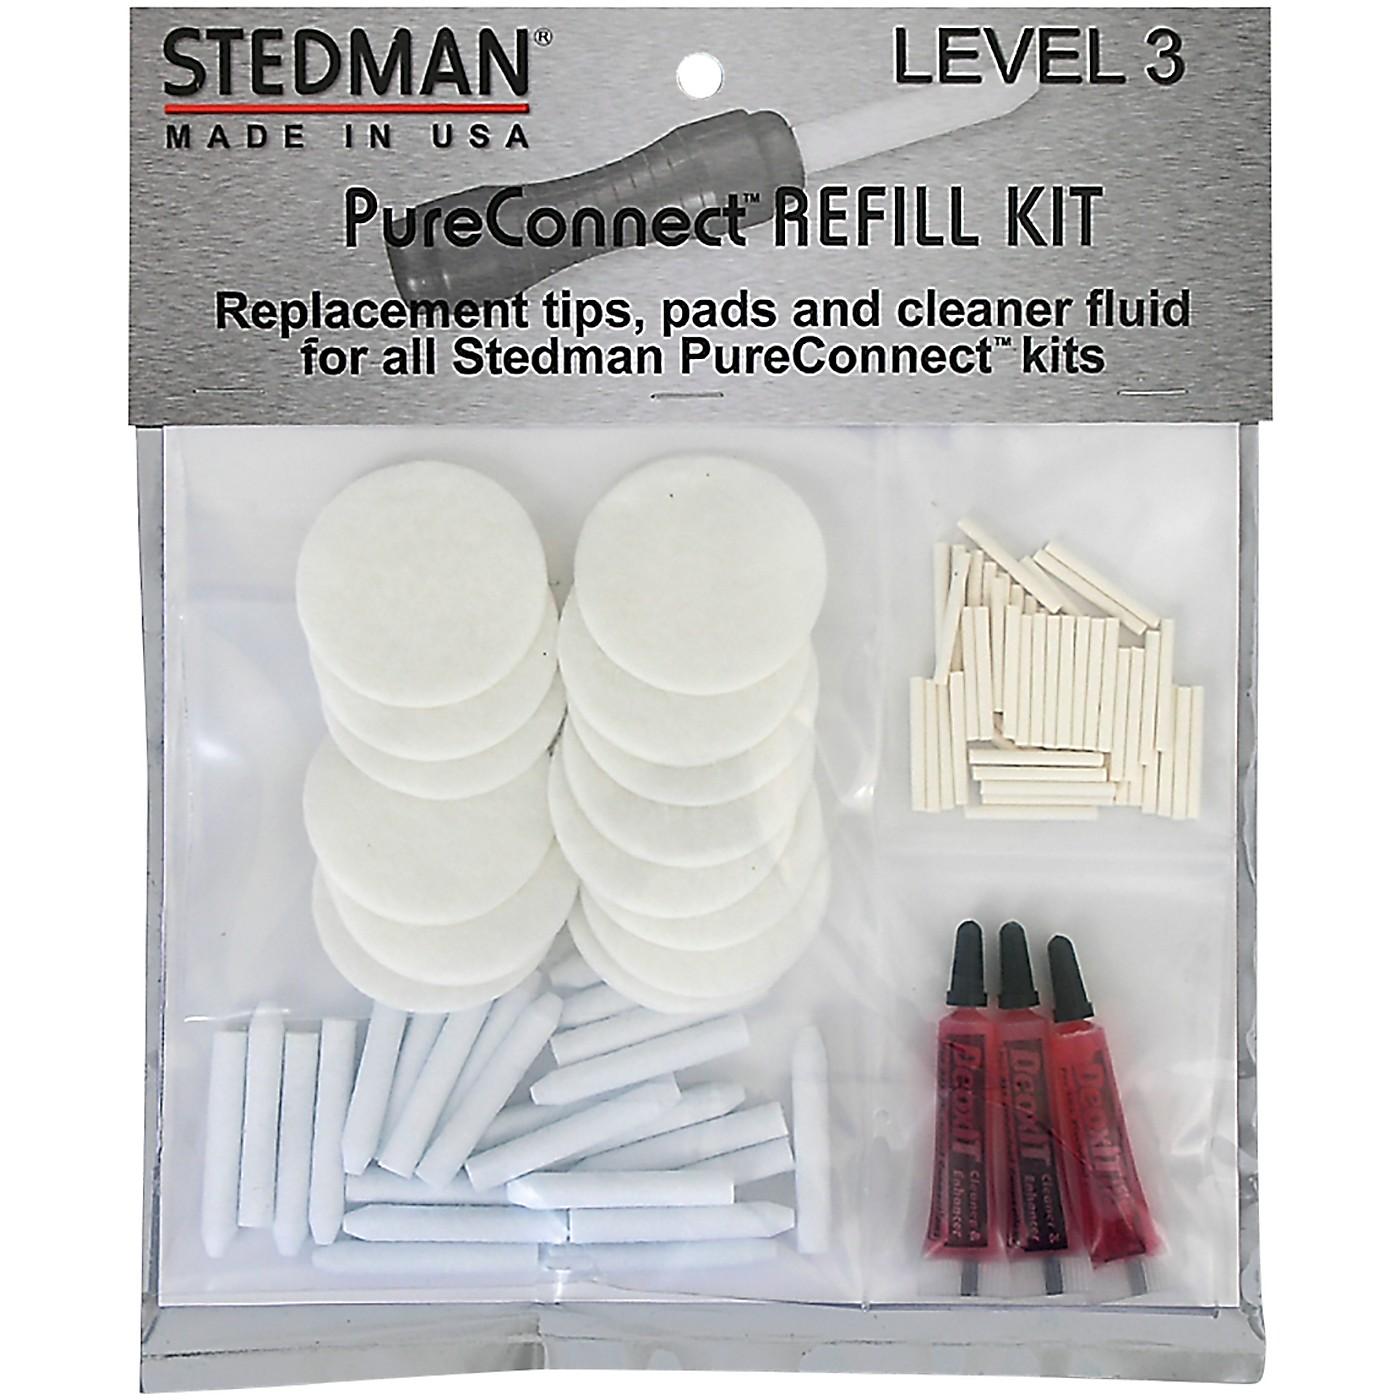 Stedman PureConnect Level 3 Refill Kit thumbnail